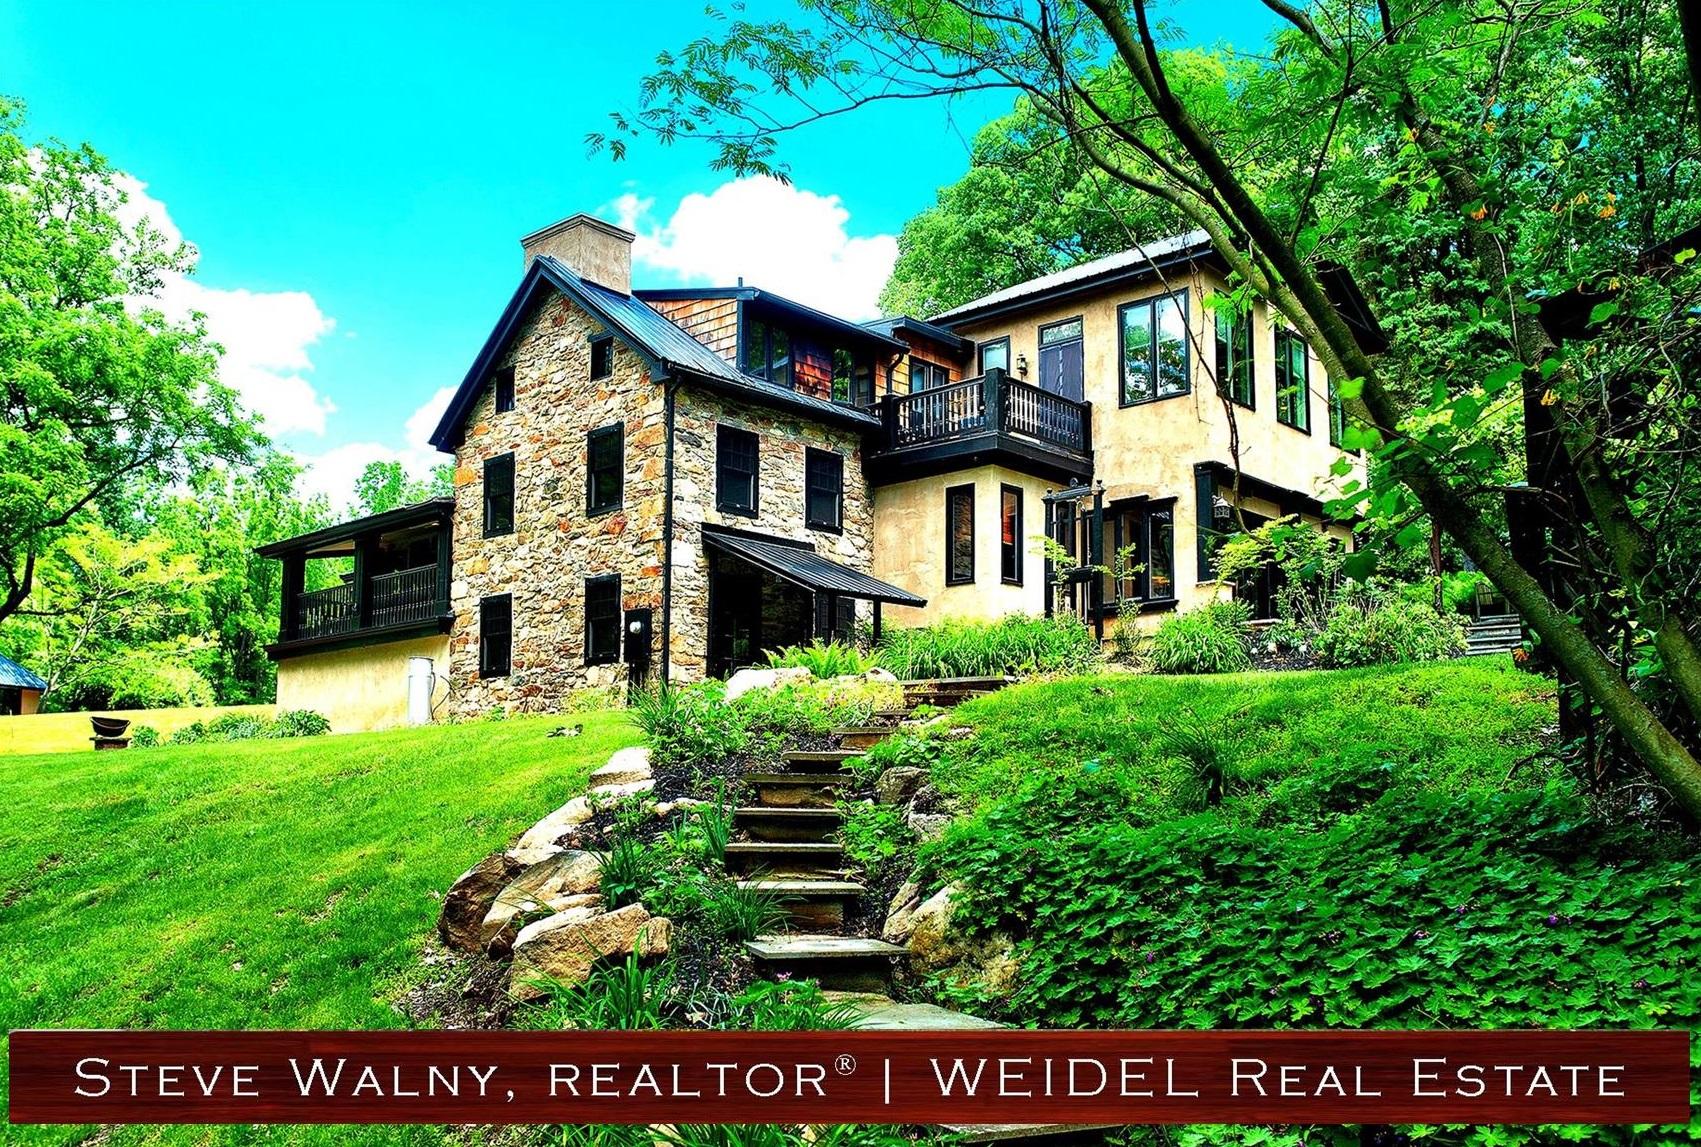 Stone Homes in Bucks for Sale | Bucks County Stone Homes | Old Bucks